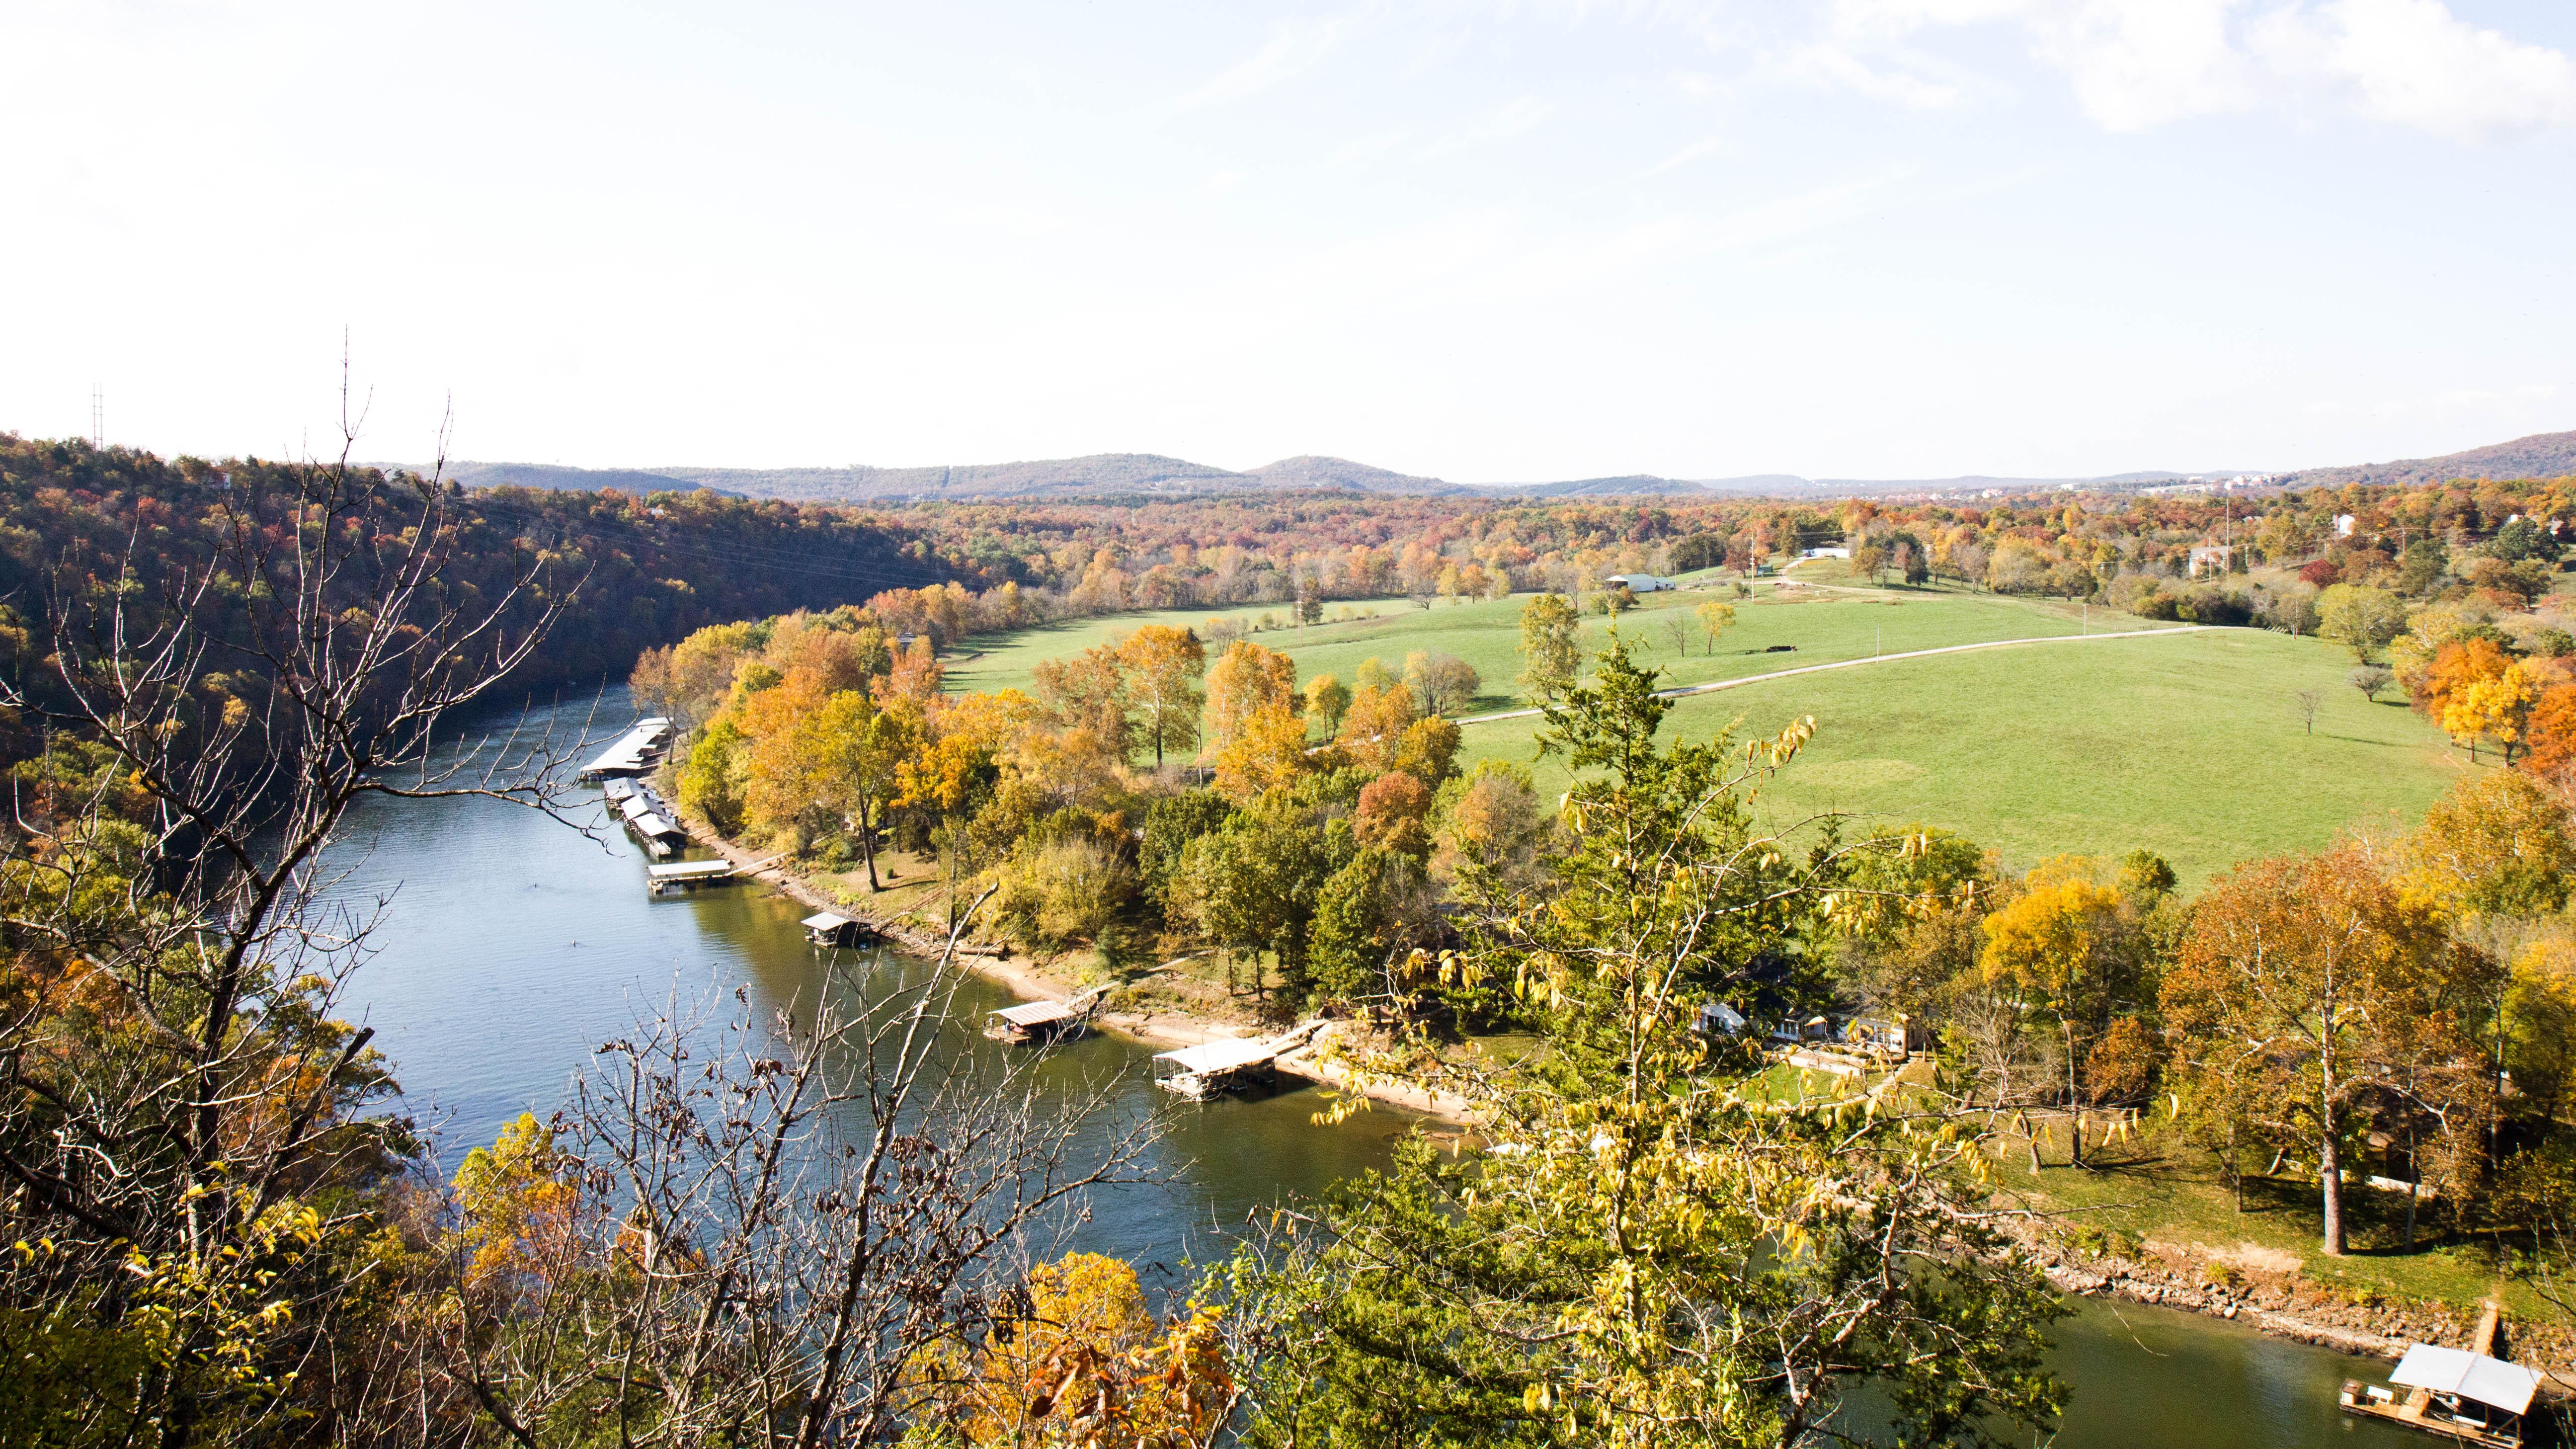 """La Riviere Blanche"" flows beneath Branson's unparalleled Lakes"